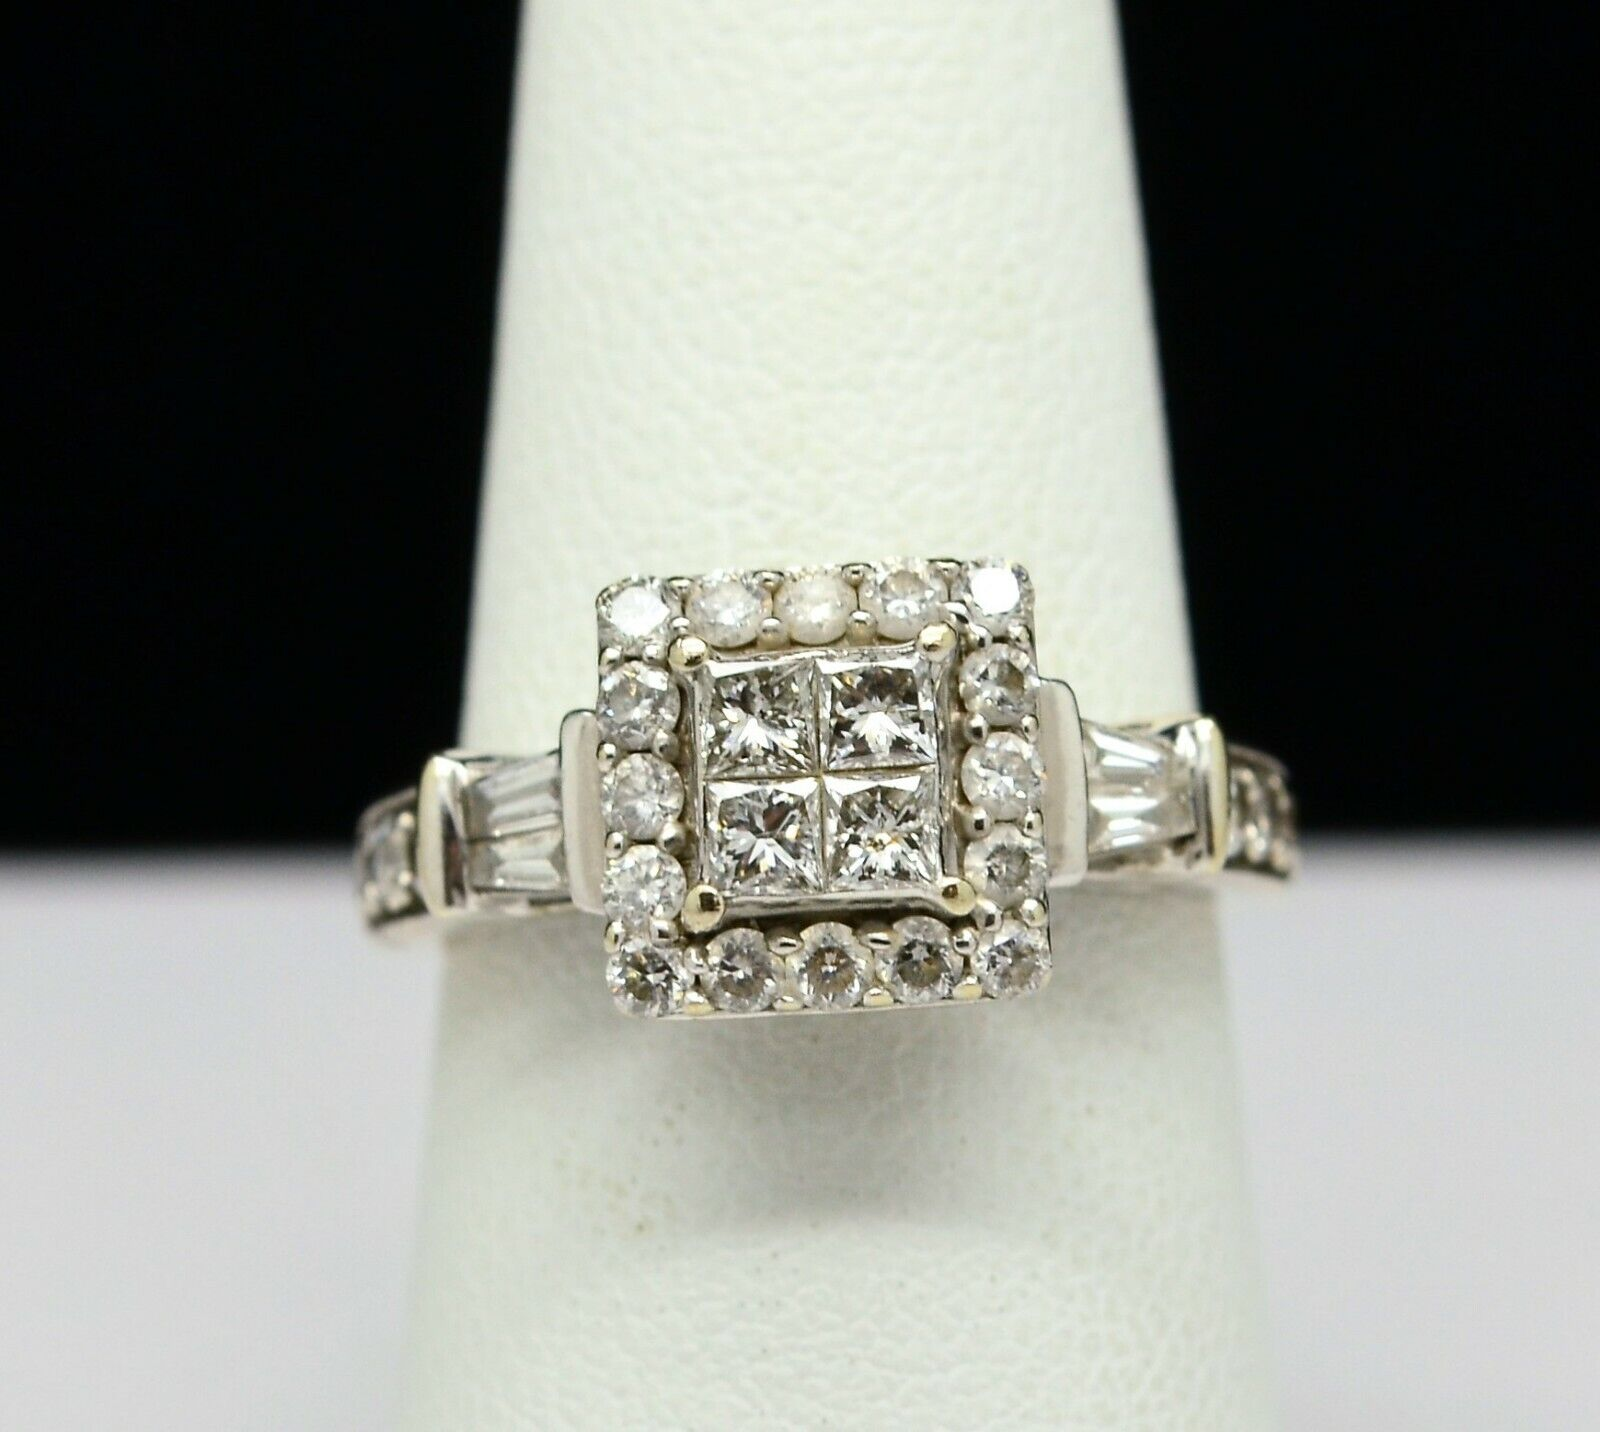 14K WHITE gold STUNNING DIAMOND CLUSTER RING 1.0 CTW SZ 6.5 gold-213